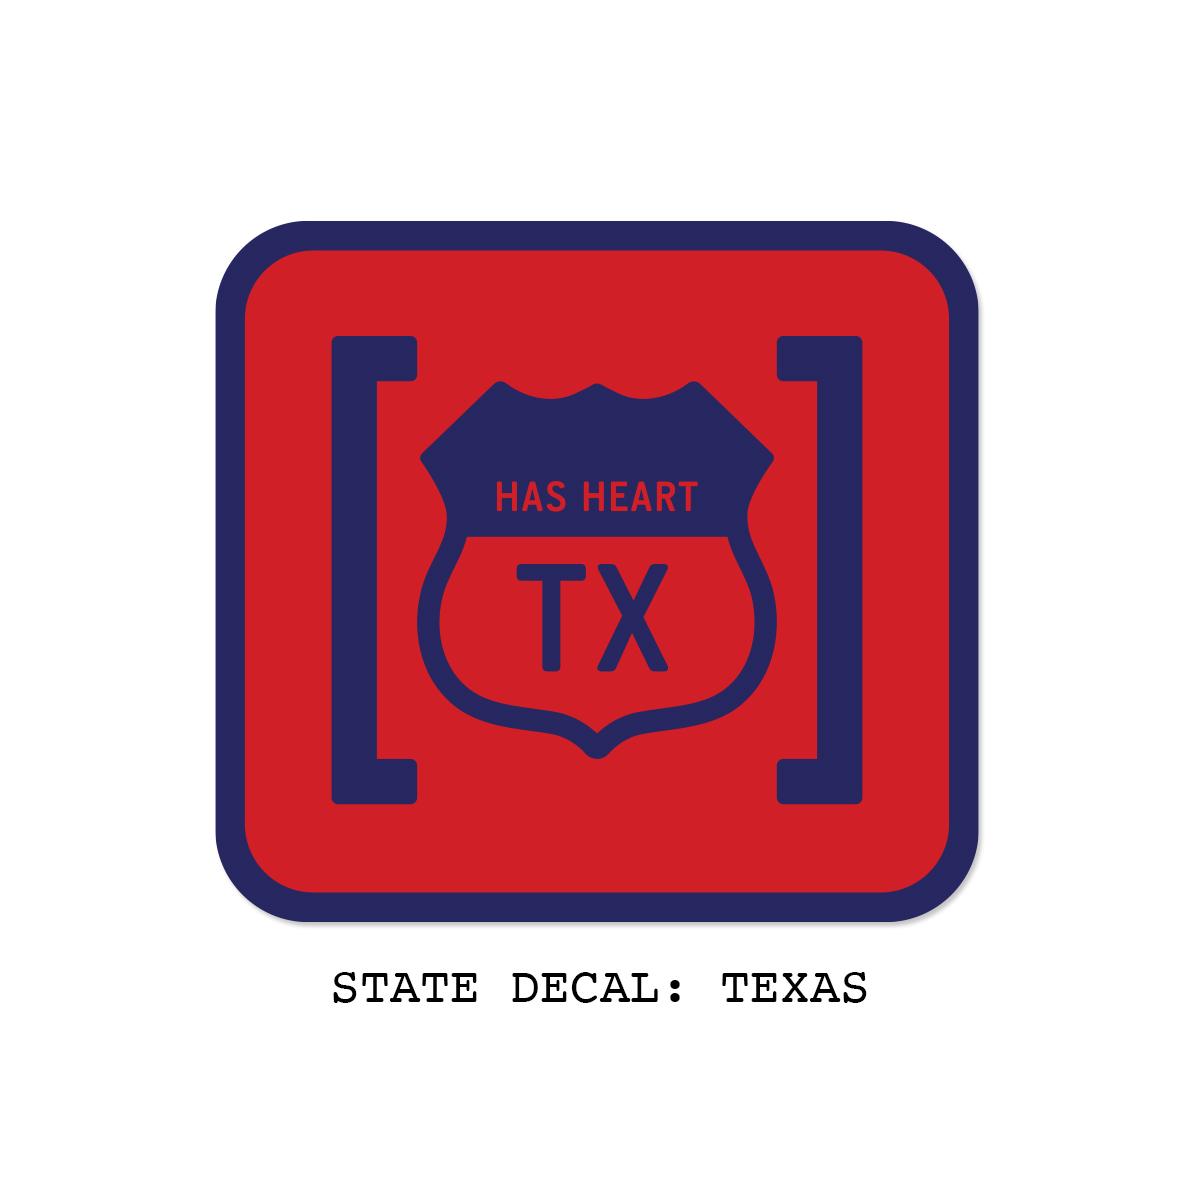 hasheart-statedecal-TX